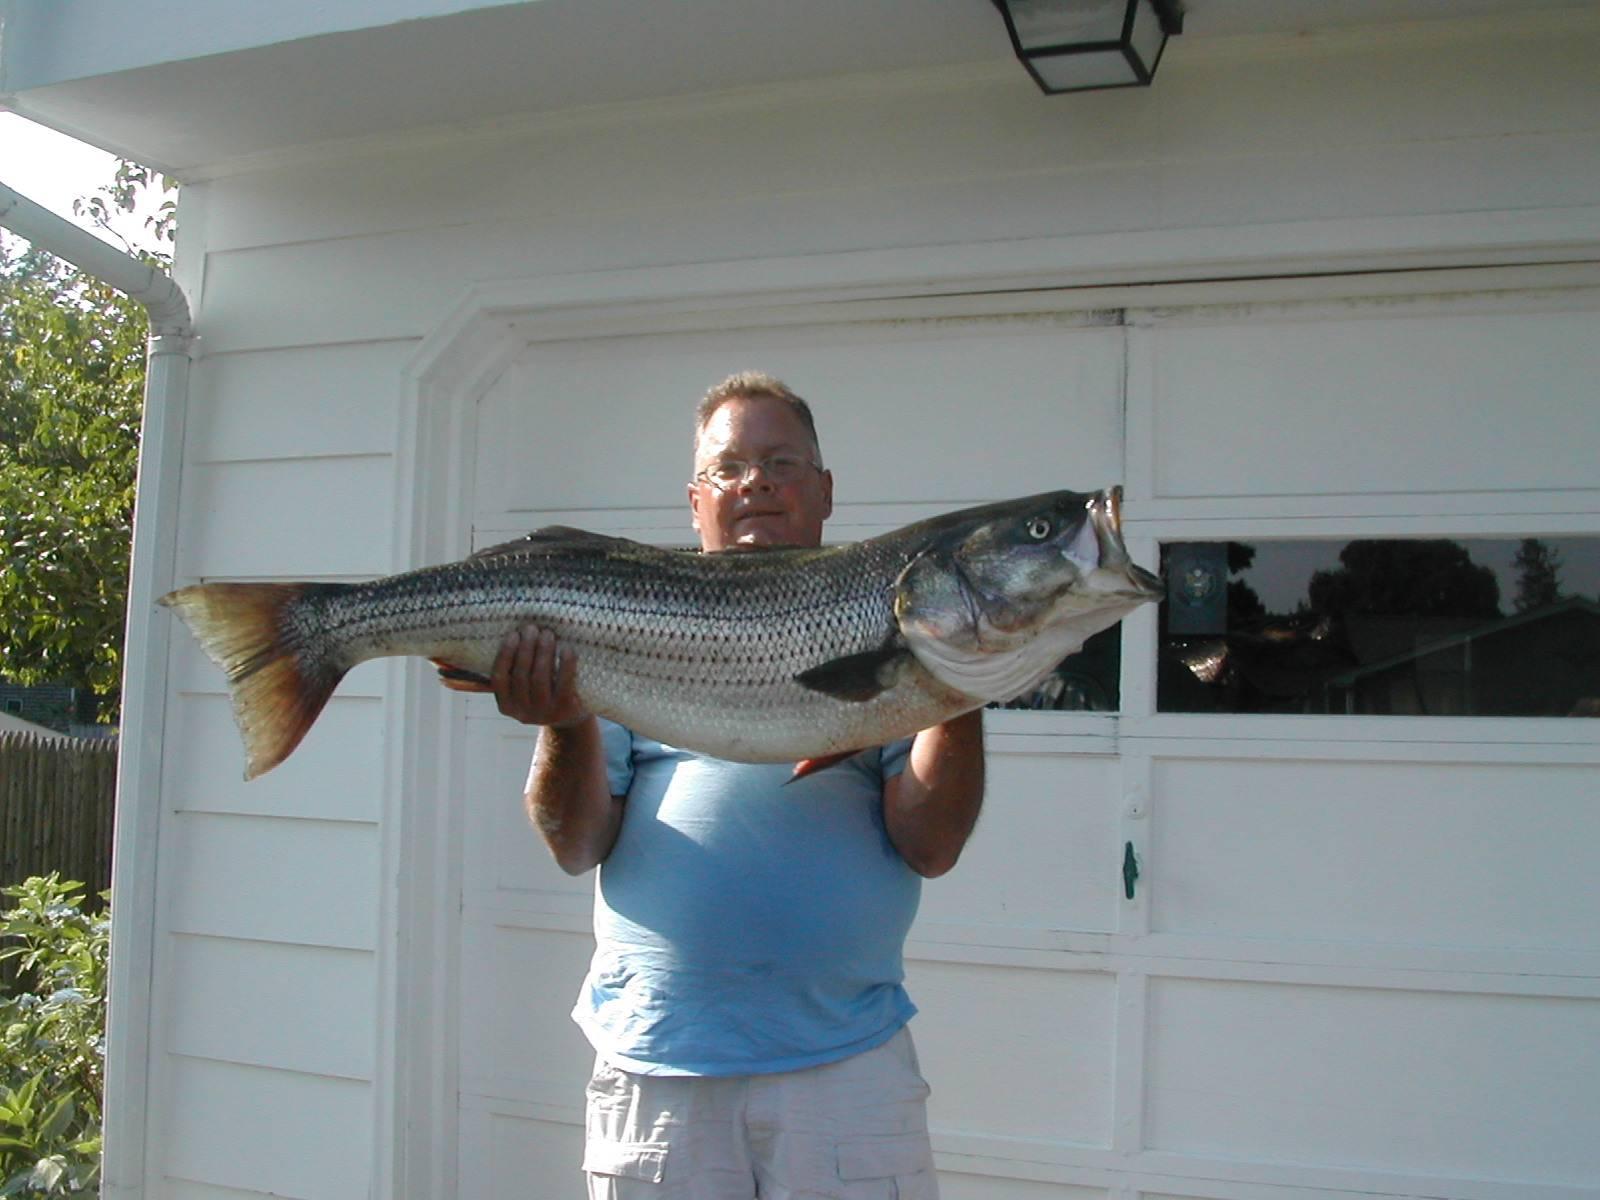 34.27 - 7/6/2012, Block Island